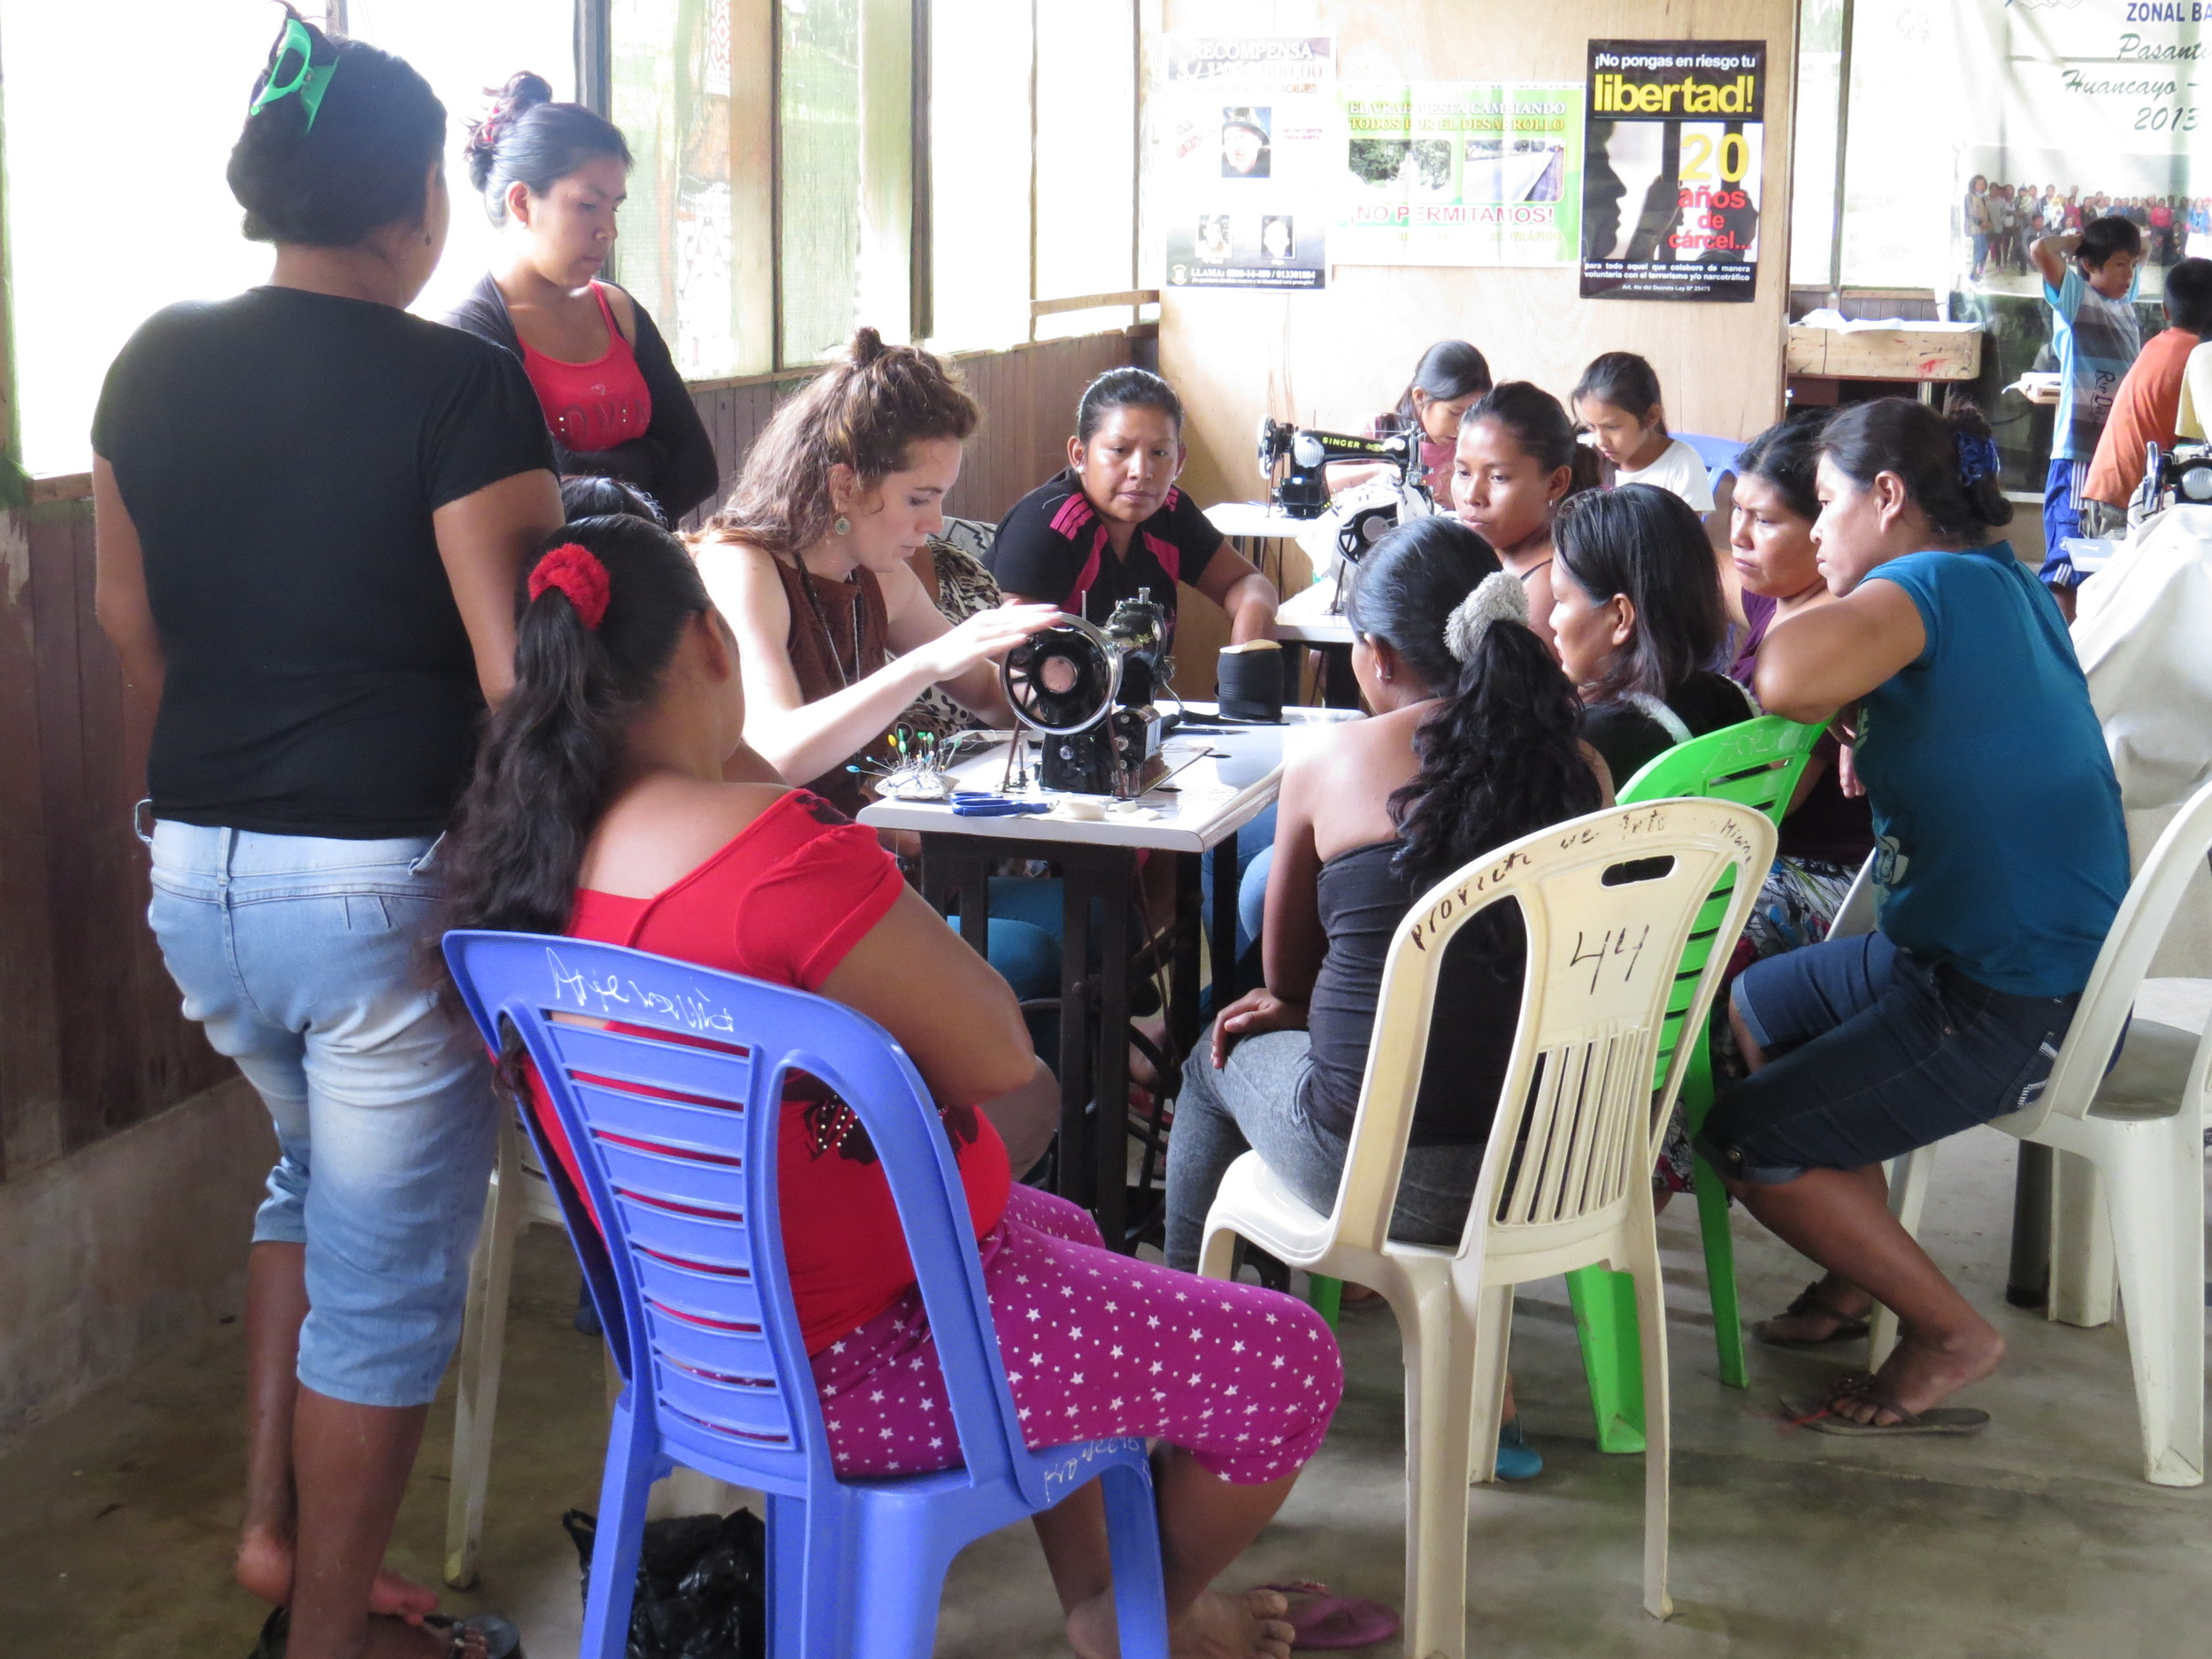 Sewing workshop in the Yine Yami community of Miaria, Bajo Urubamba, Peru